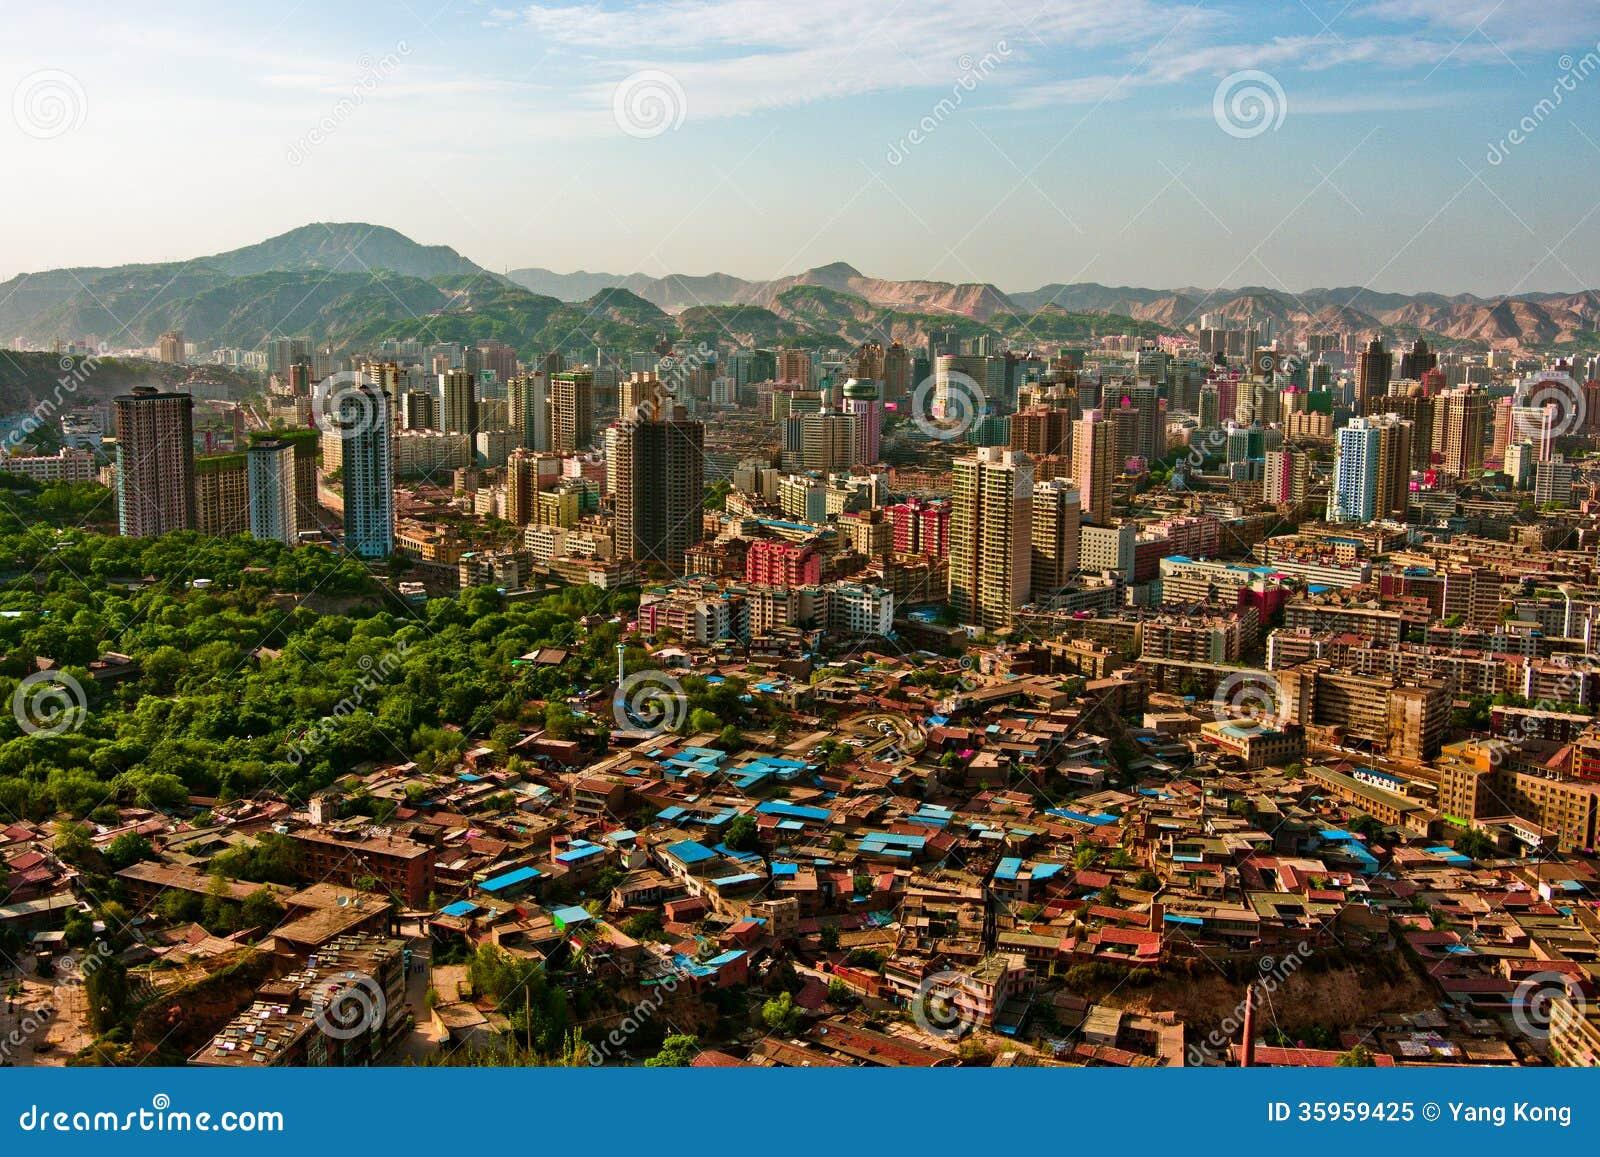 Lanzhou gansu